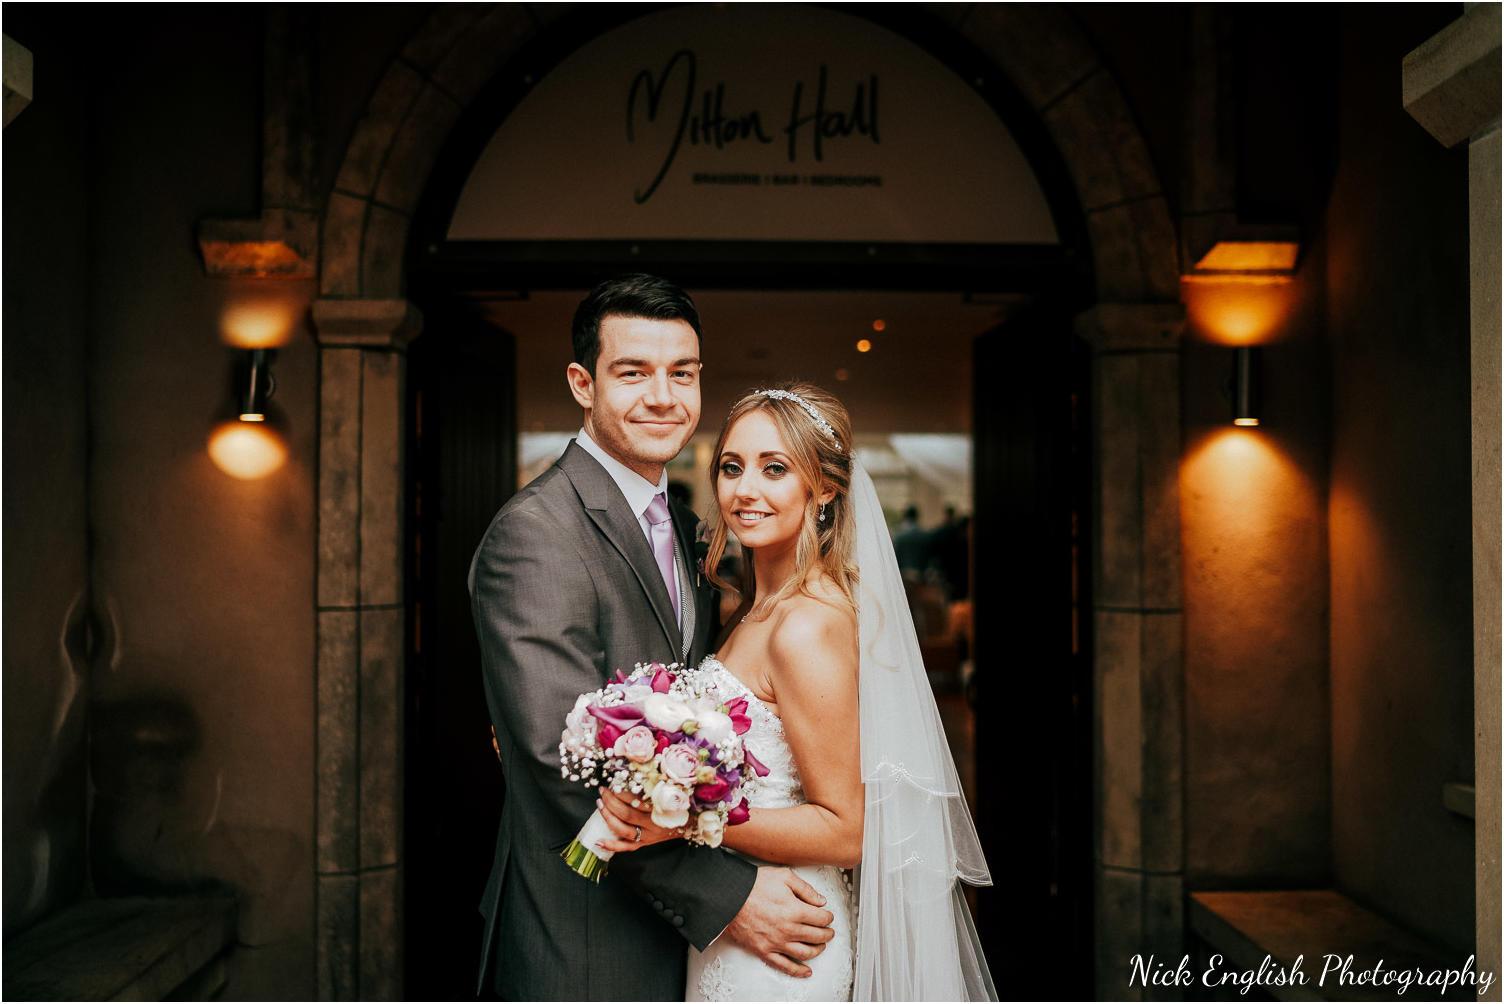 Mitton_Hall_Wedding_Photographer_2018-117.jpg